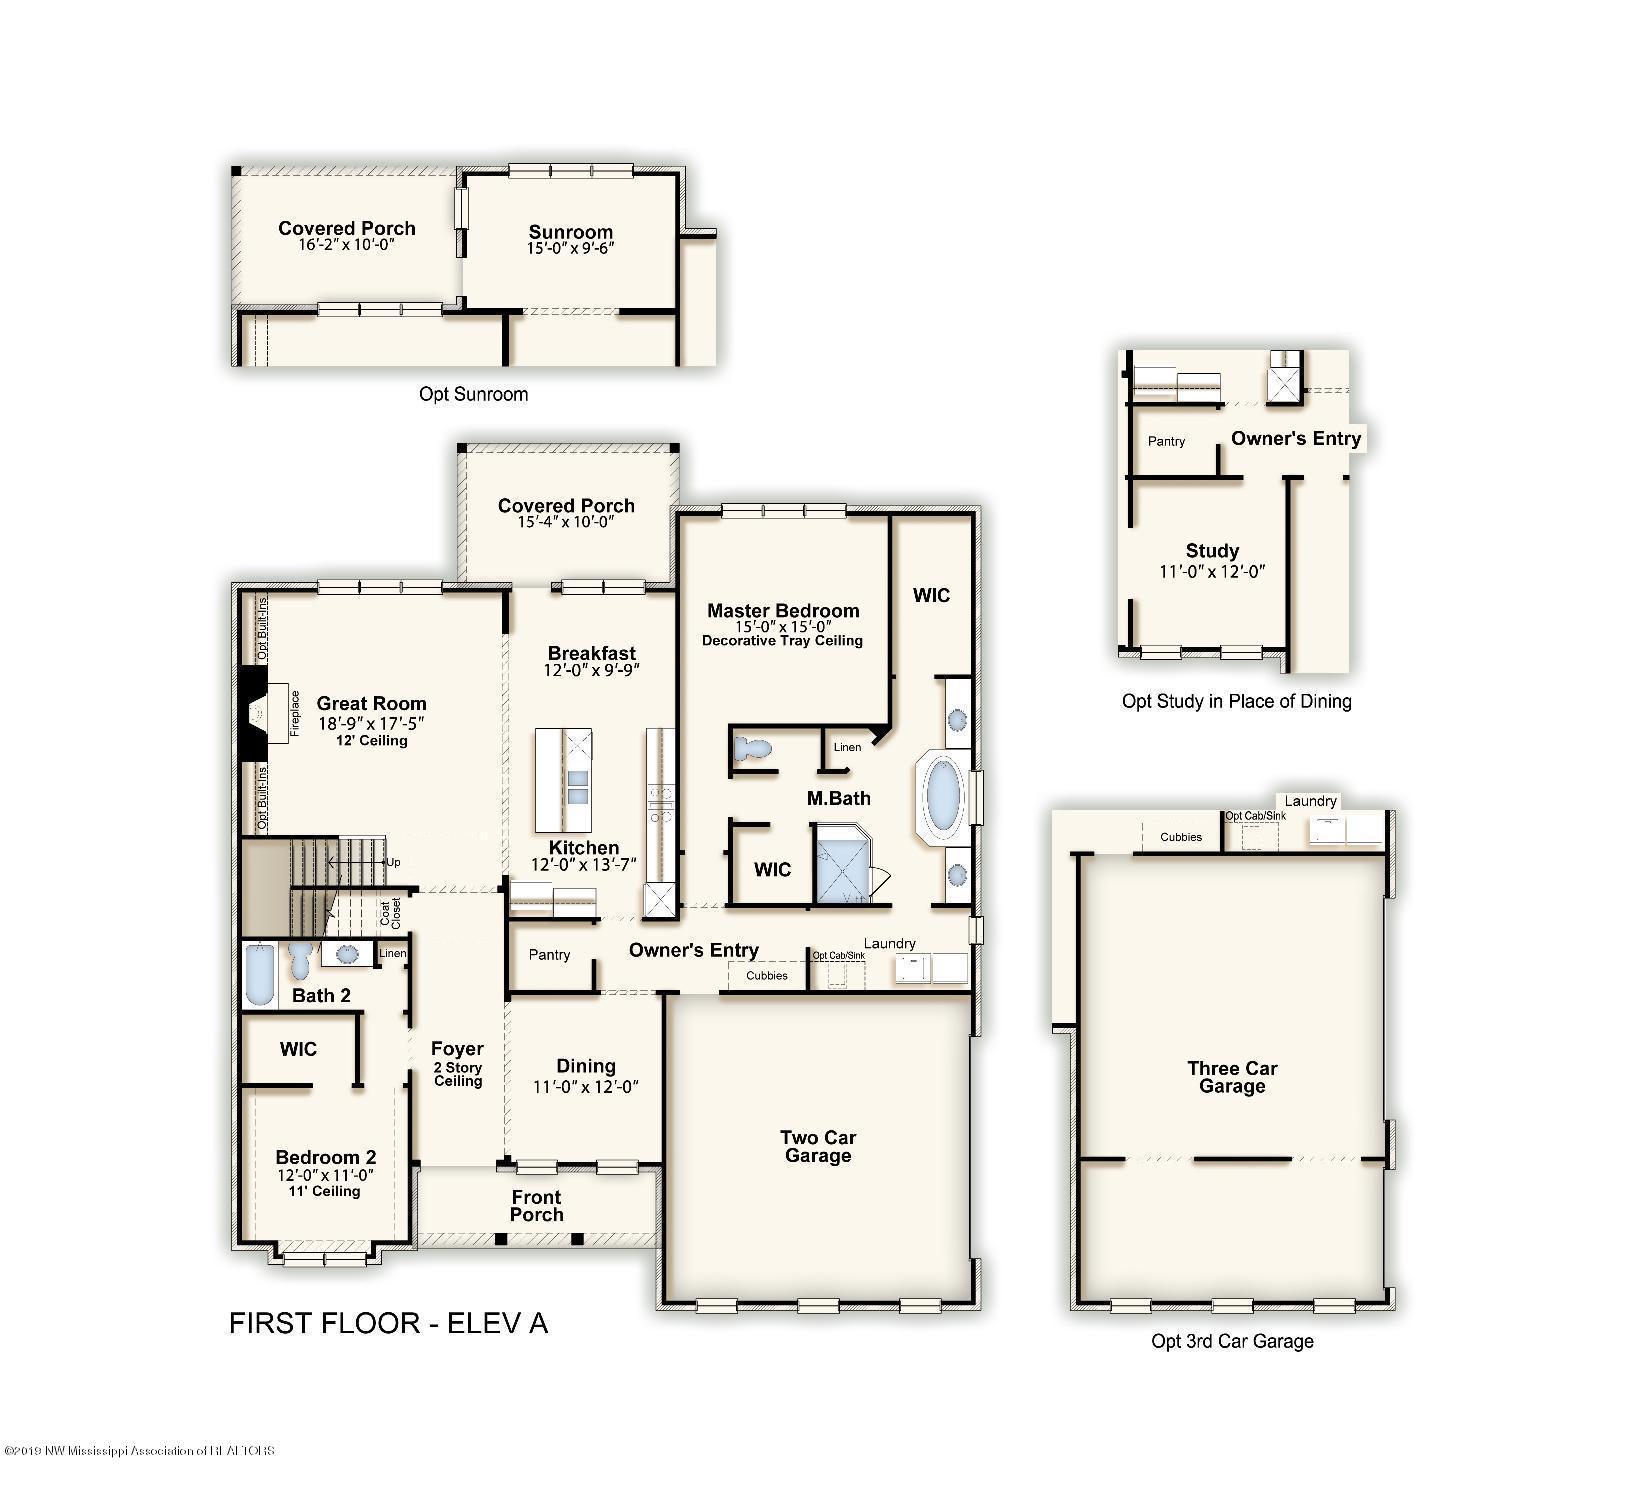 Bentley first floor - Elev A